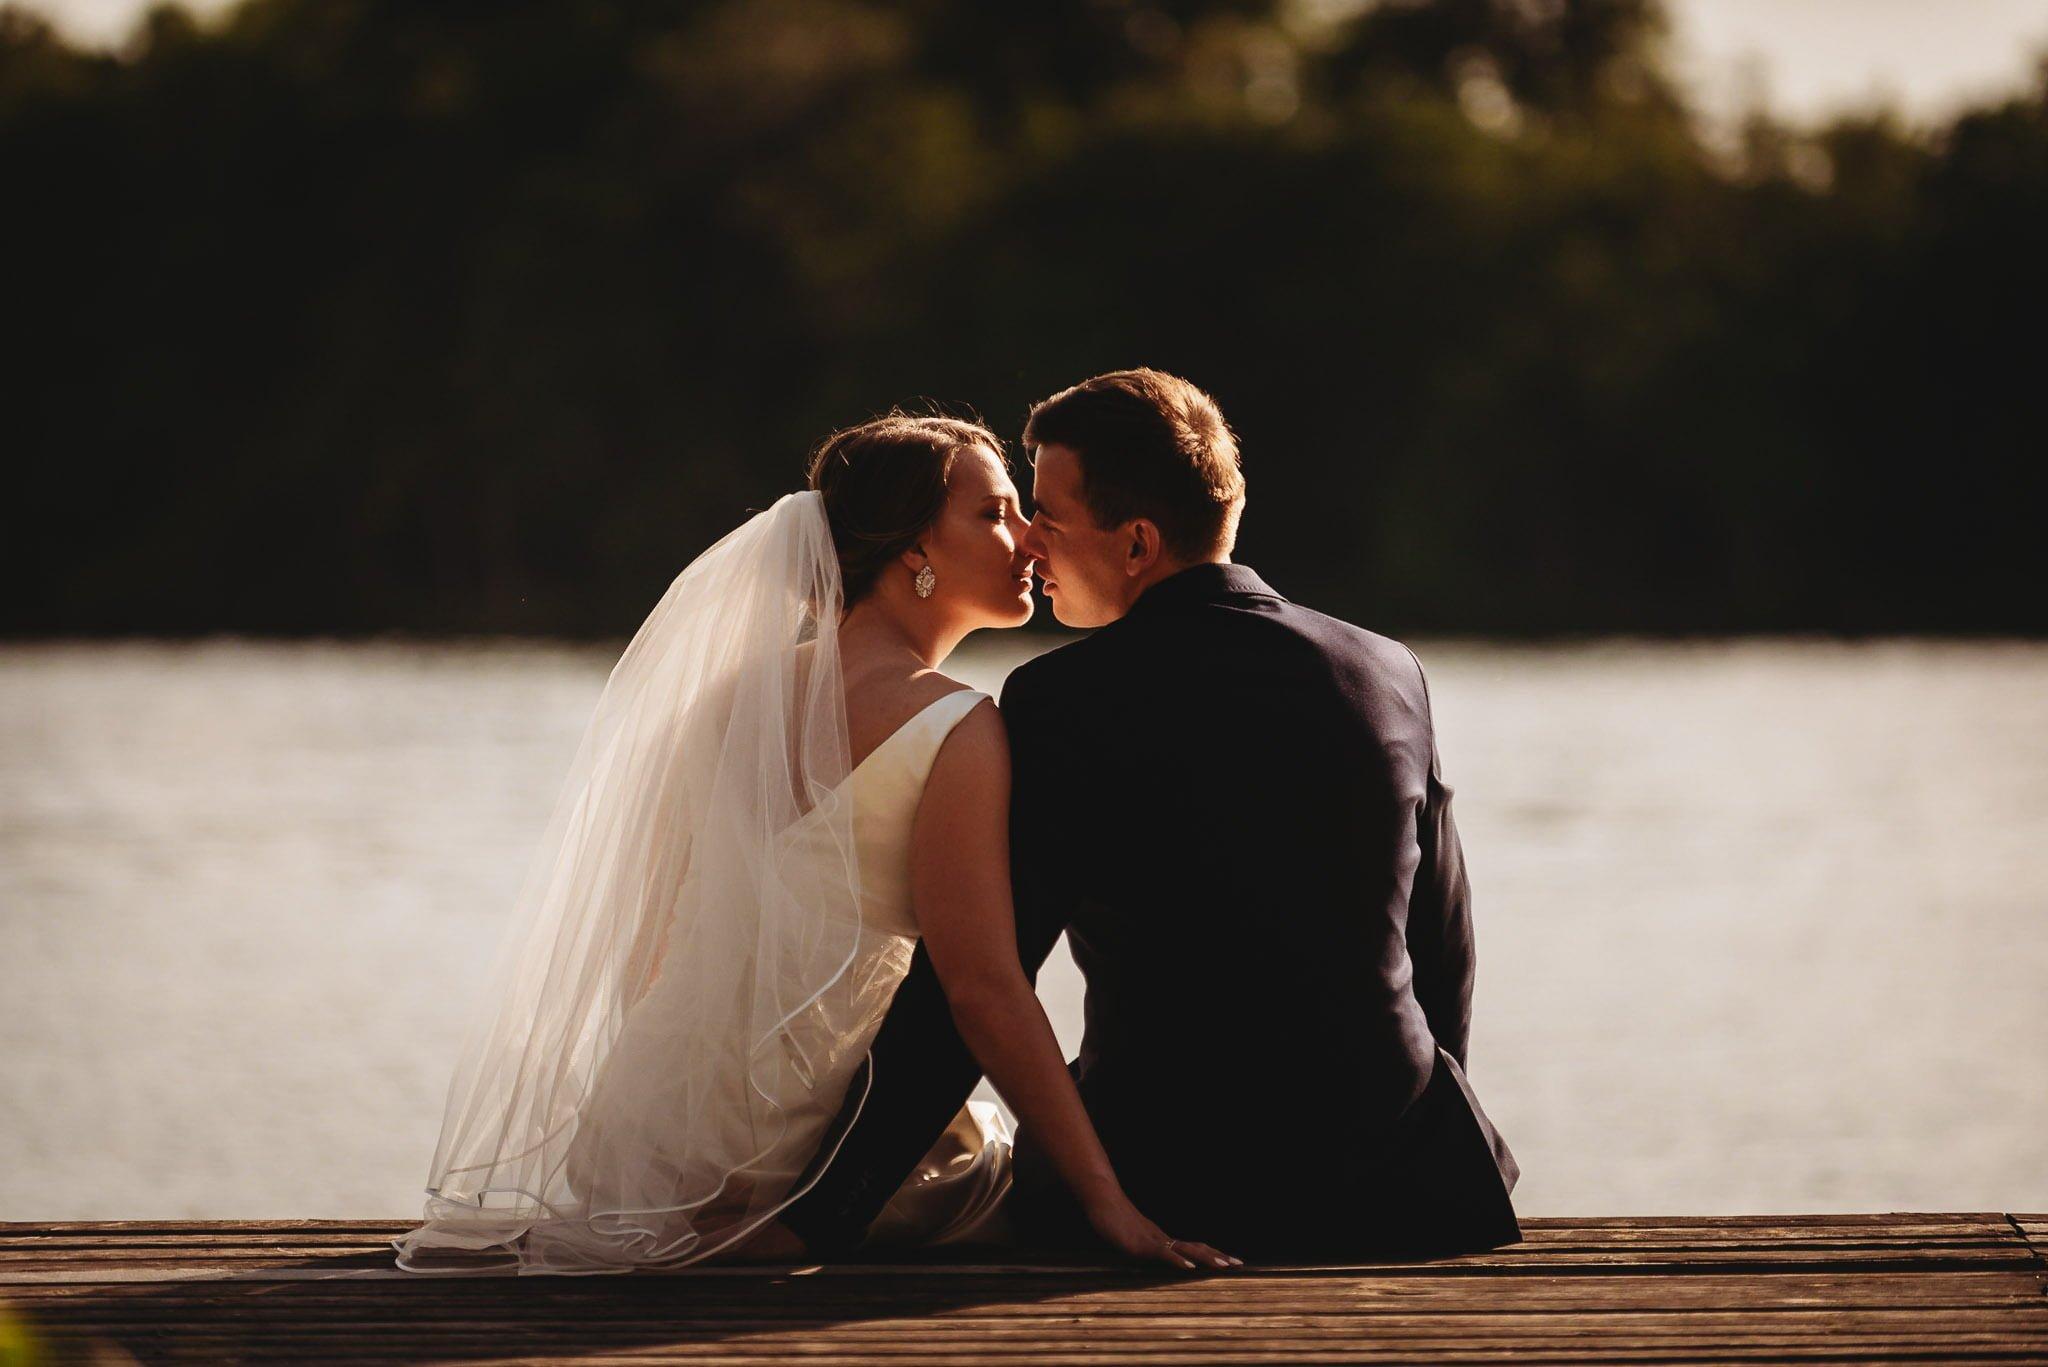 sesja ślubna, ślesin, marina, pan młody, panna młoda, piękna pogoda, pocałunek,